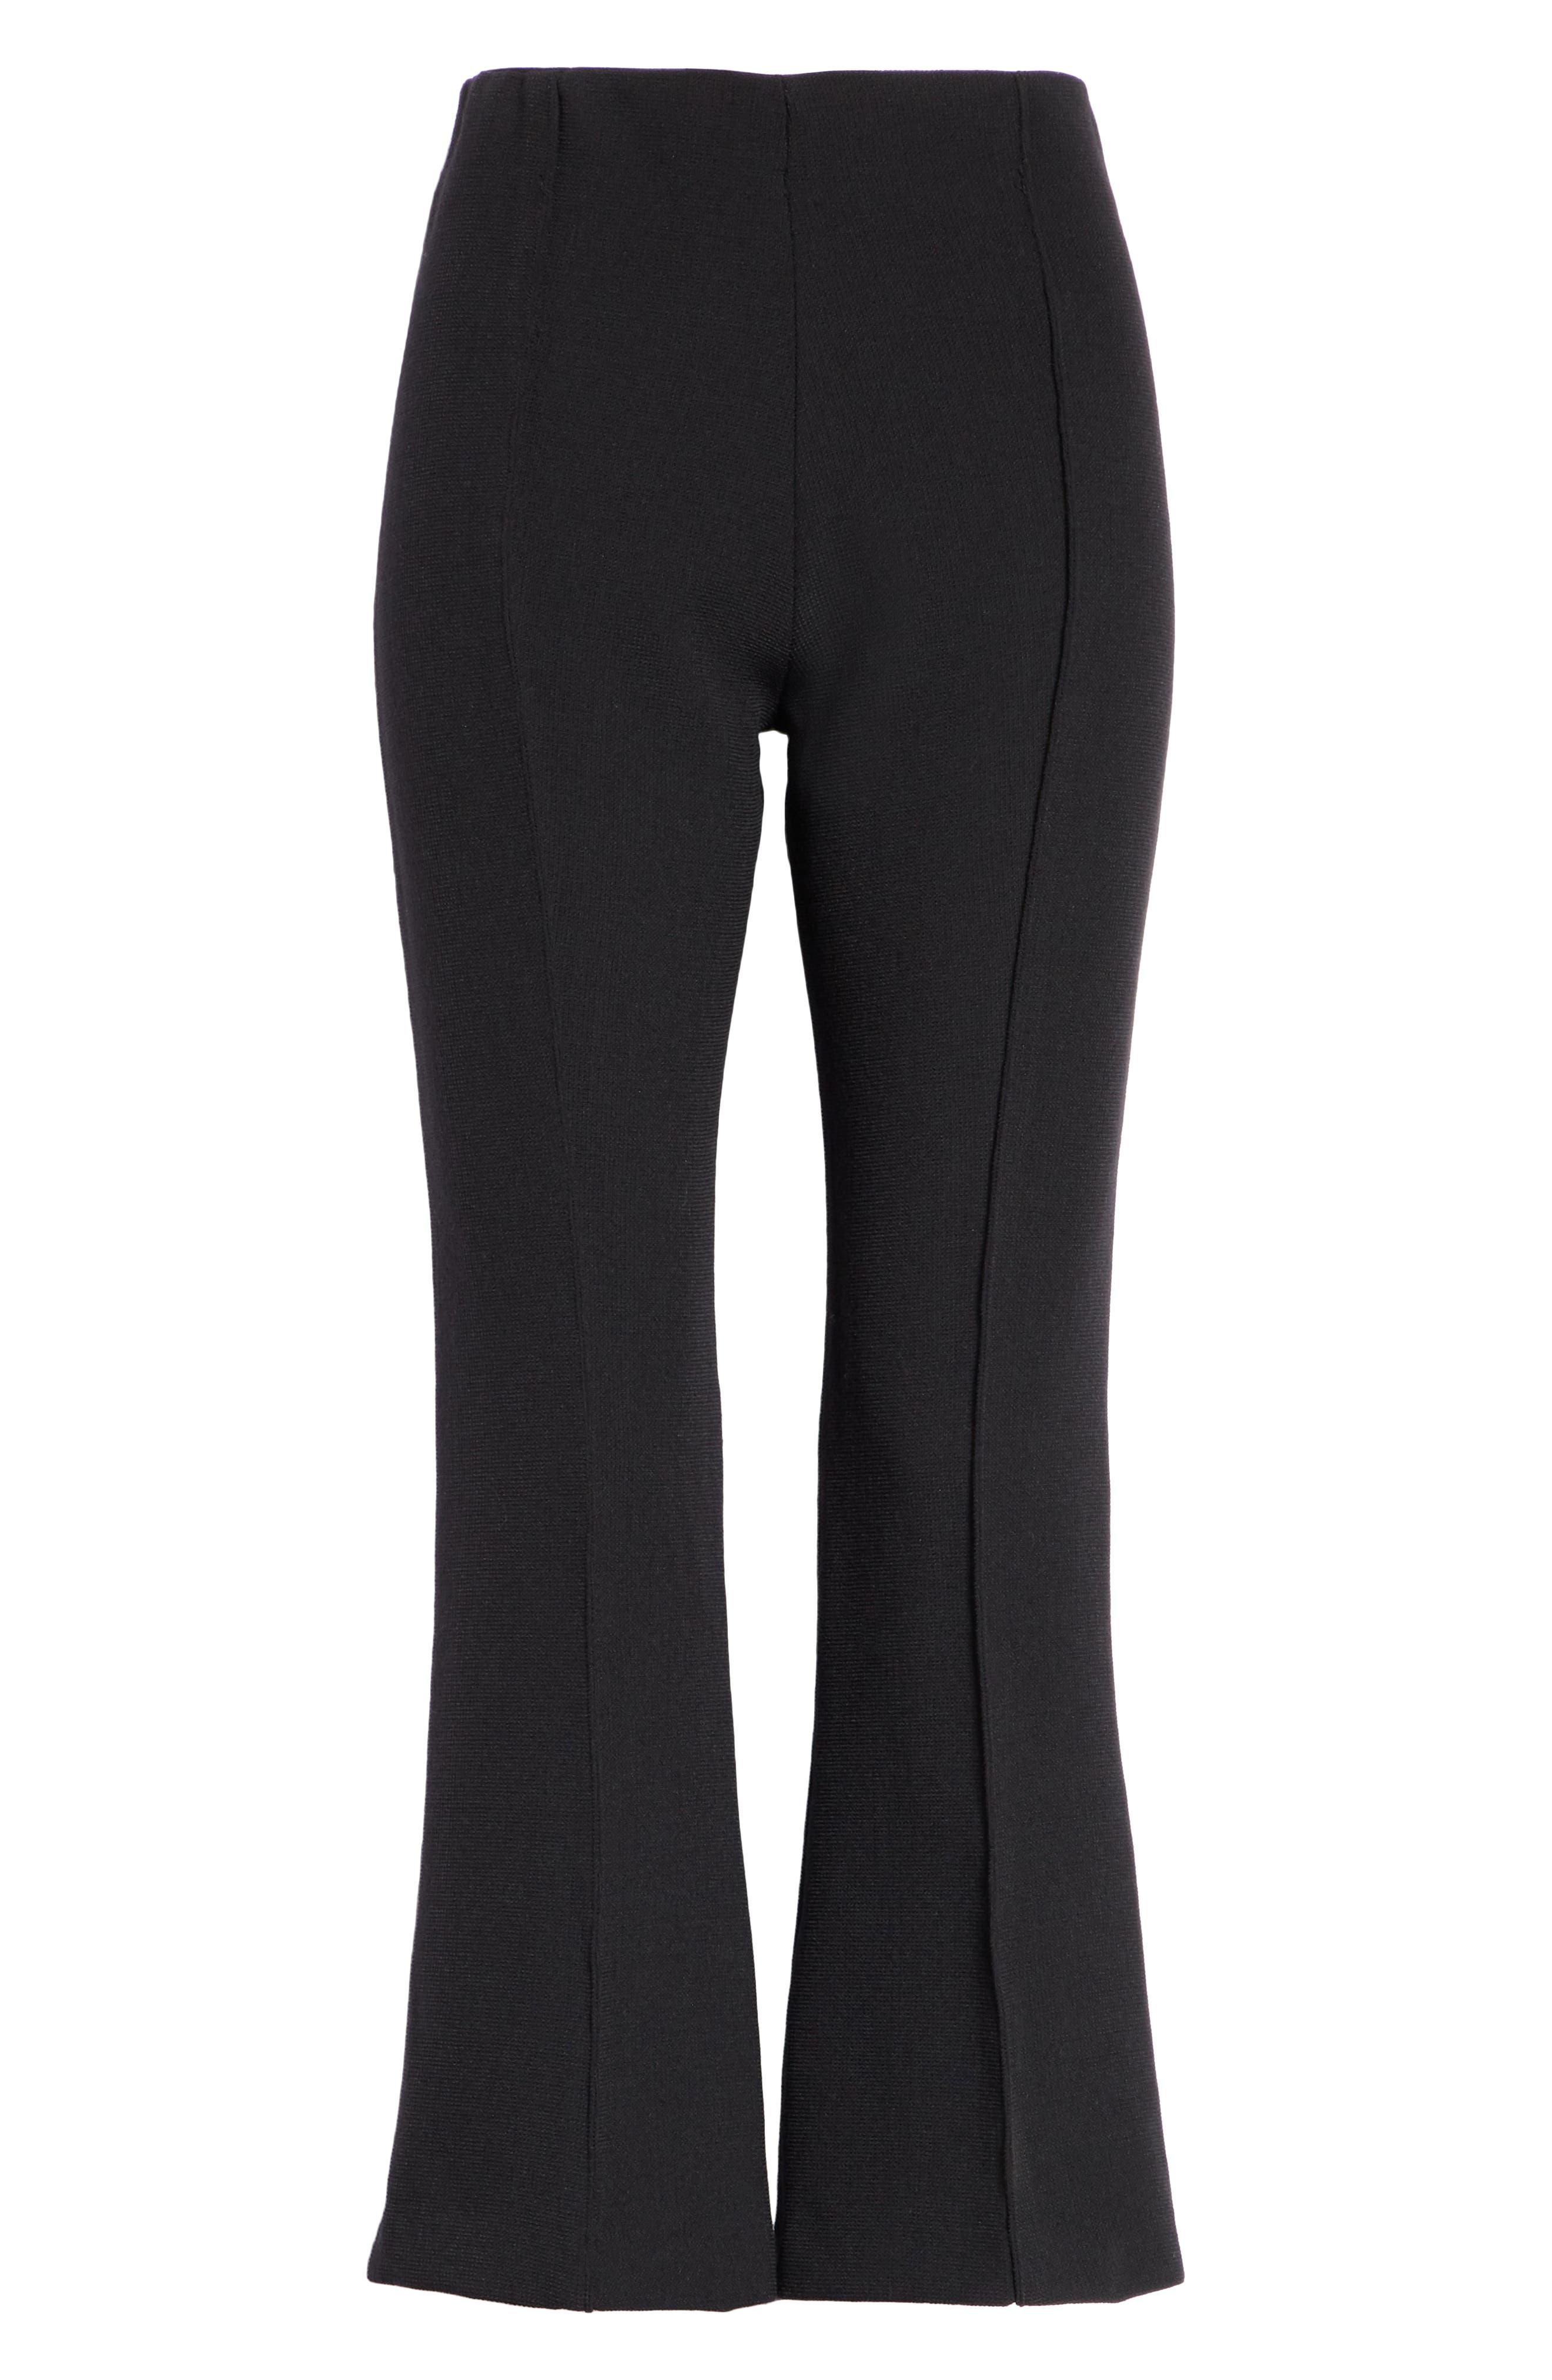 Pull-On Wool Blend Crop Flare Pants,                             Alternate thumbnail 6, color,                             BLACK PIQUE